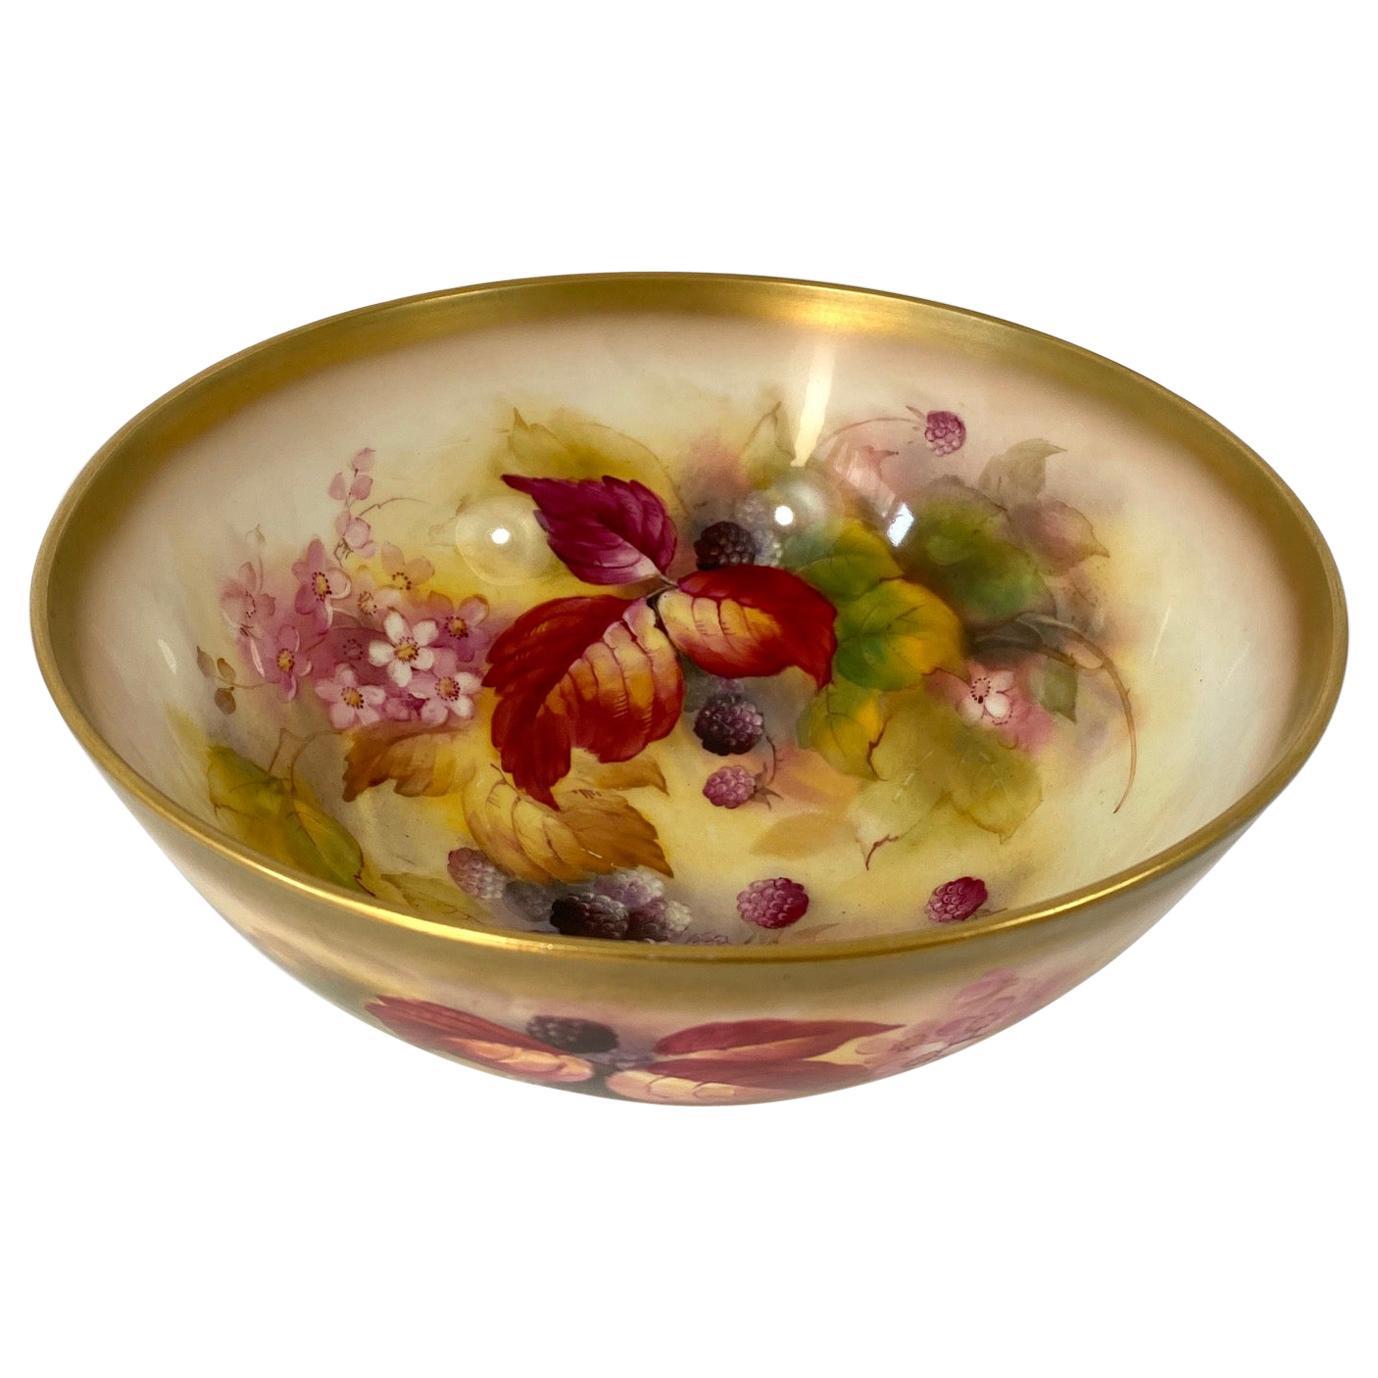 Royal Worcester Porcelain Bowl, Kitty Blake, Dated 1930